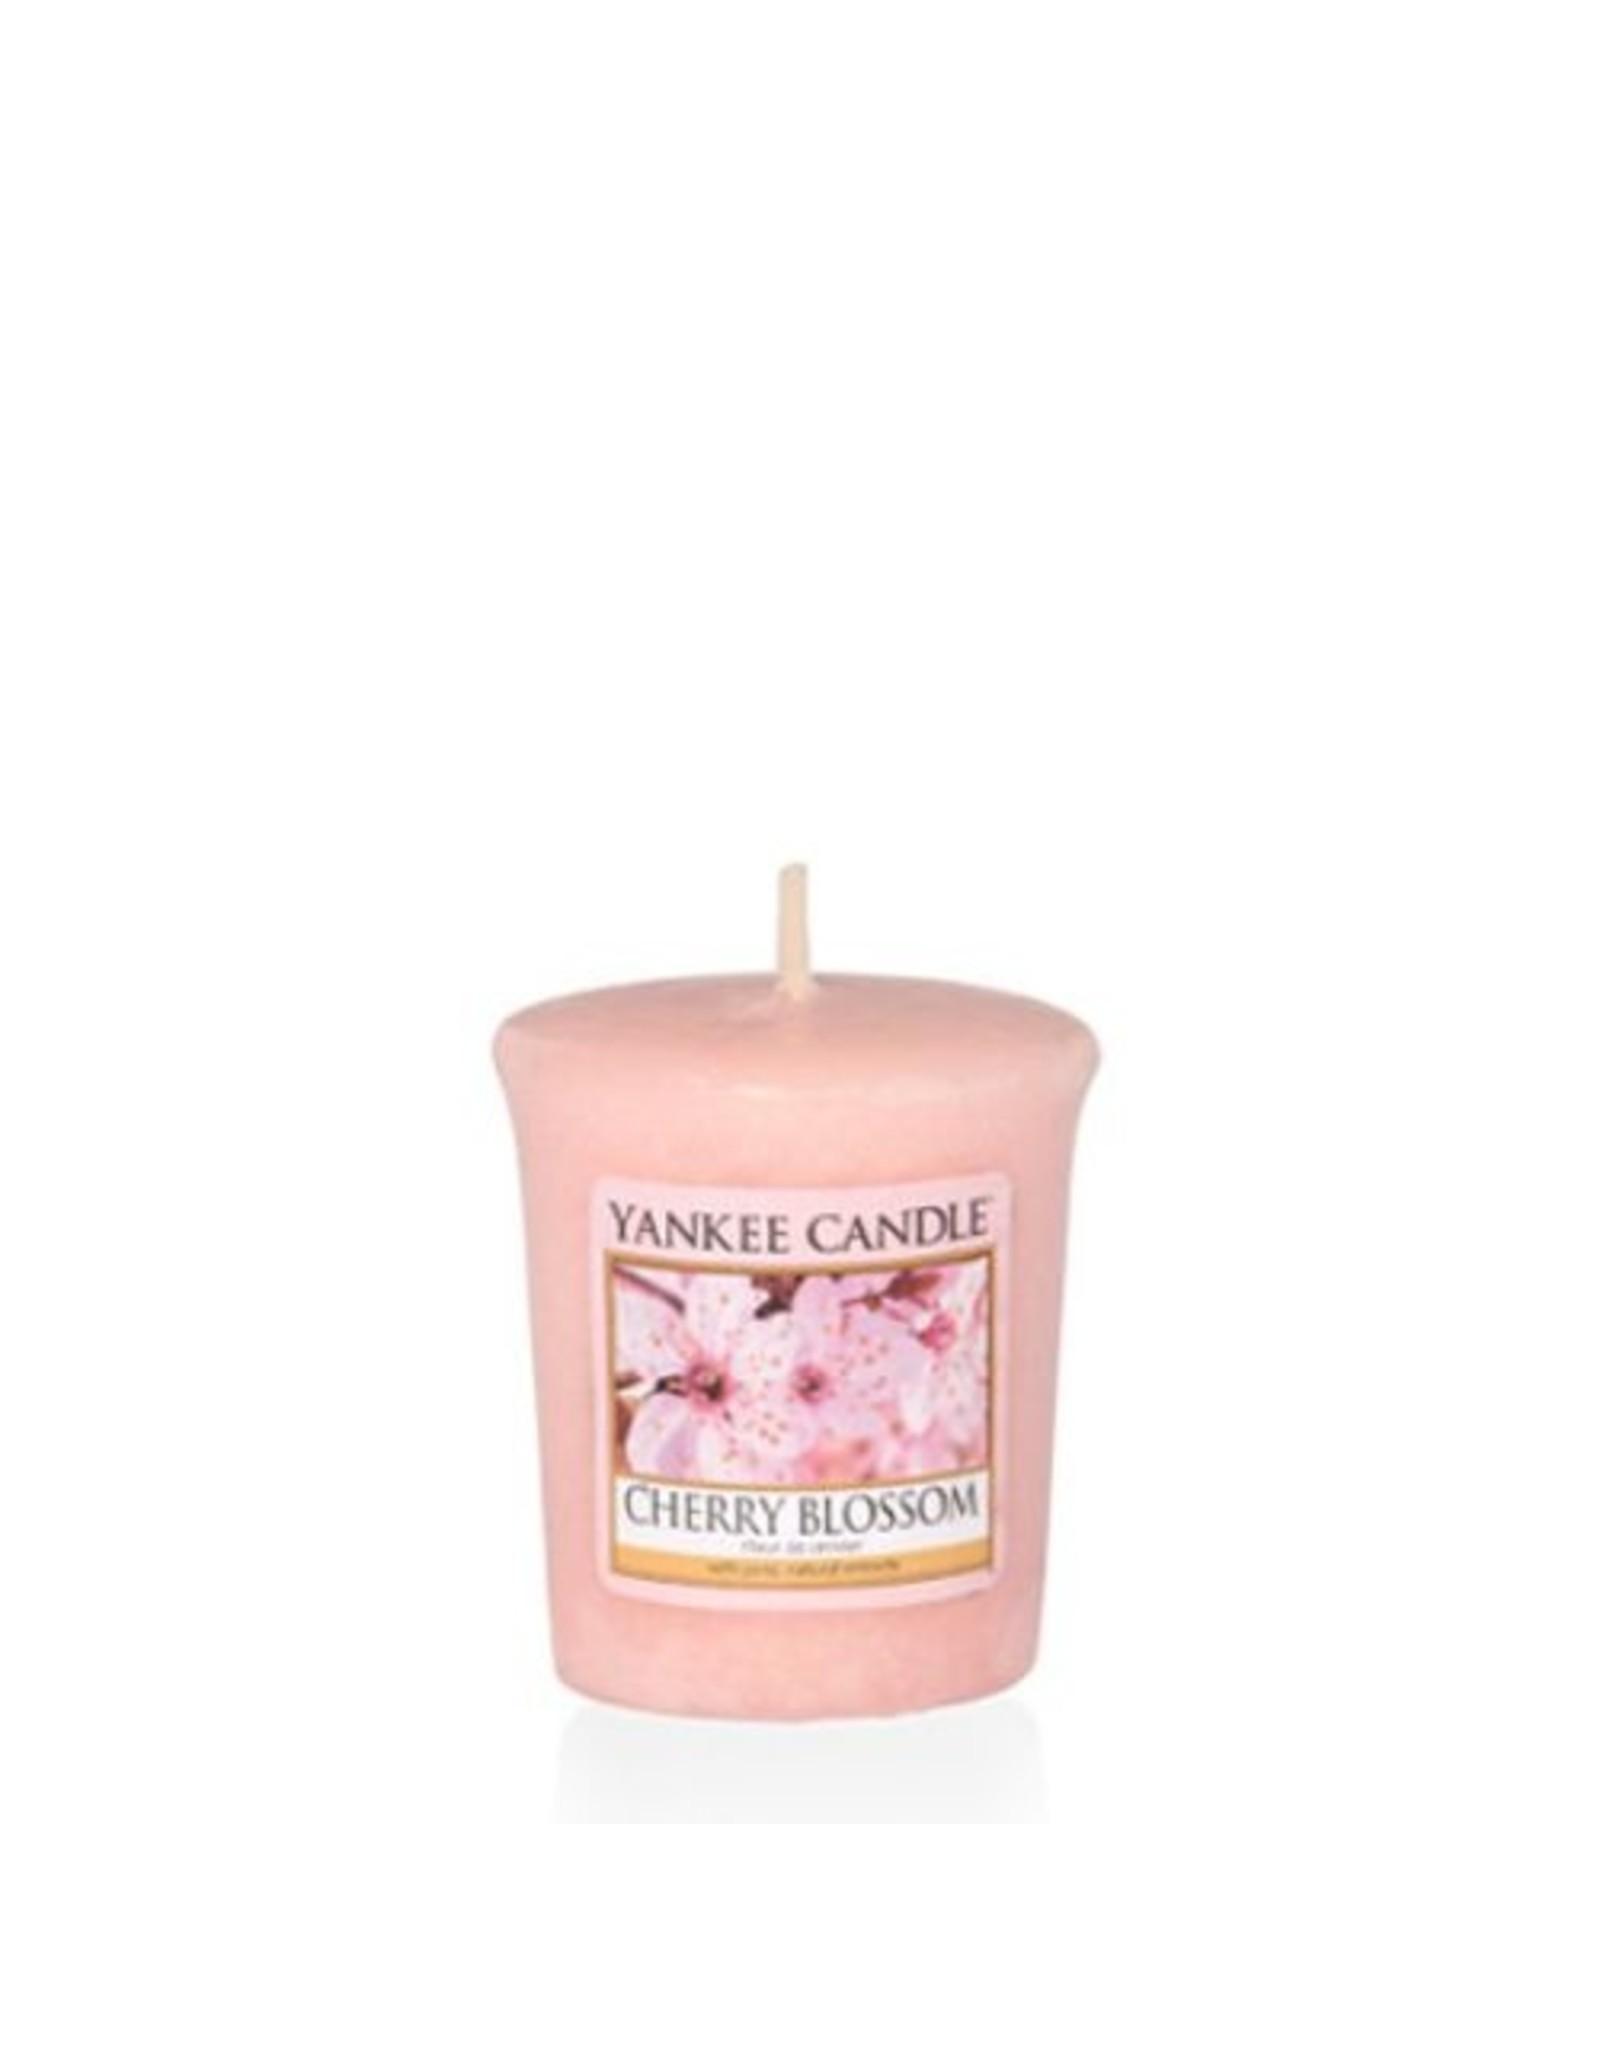 Yankee Candle Cherry Blossom Votive